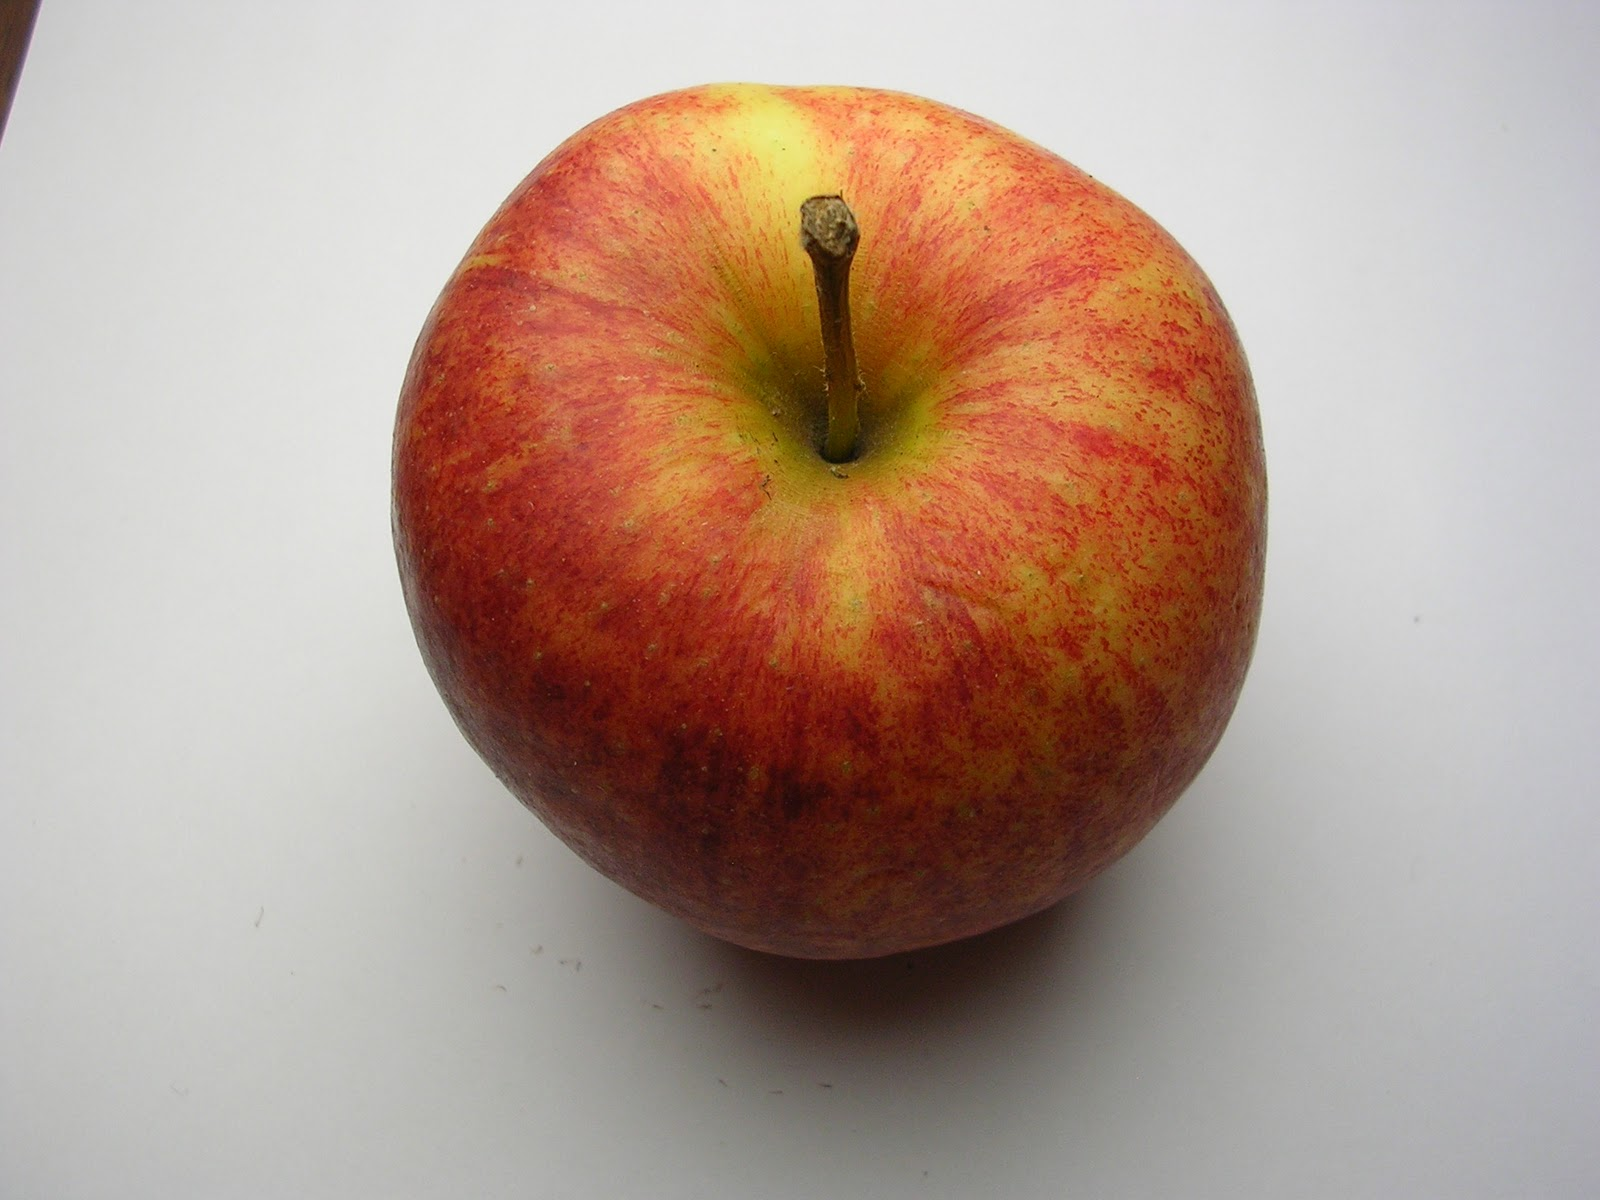 elstar apfelbaum